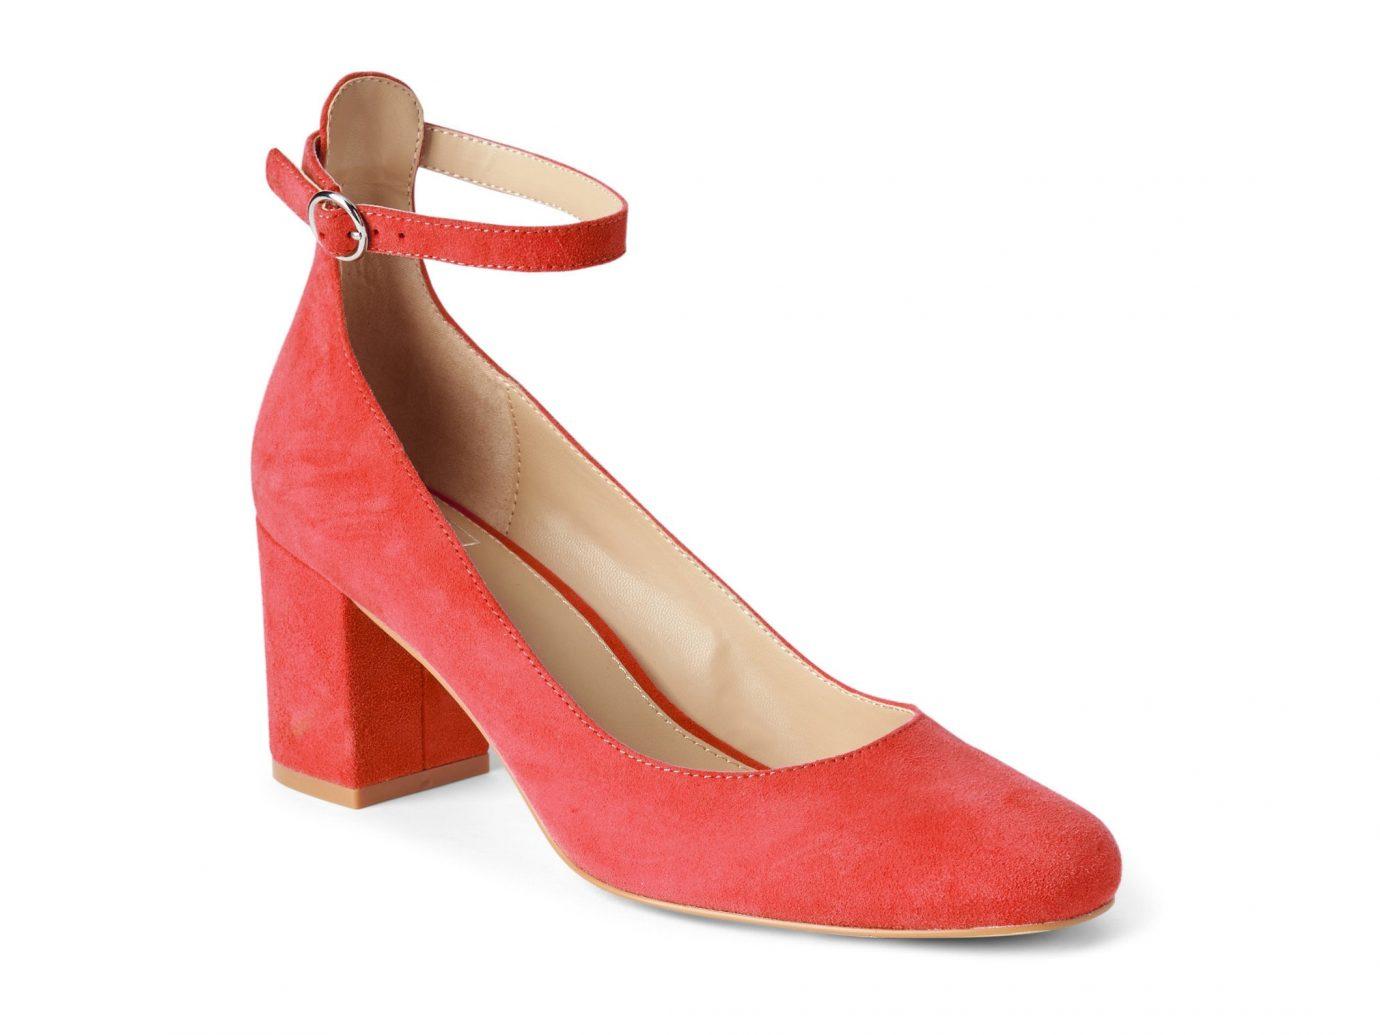 France Style + Design Travel Shop footwear high heeled footwear shoe basic pump sandal suede peach product design product